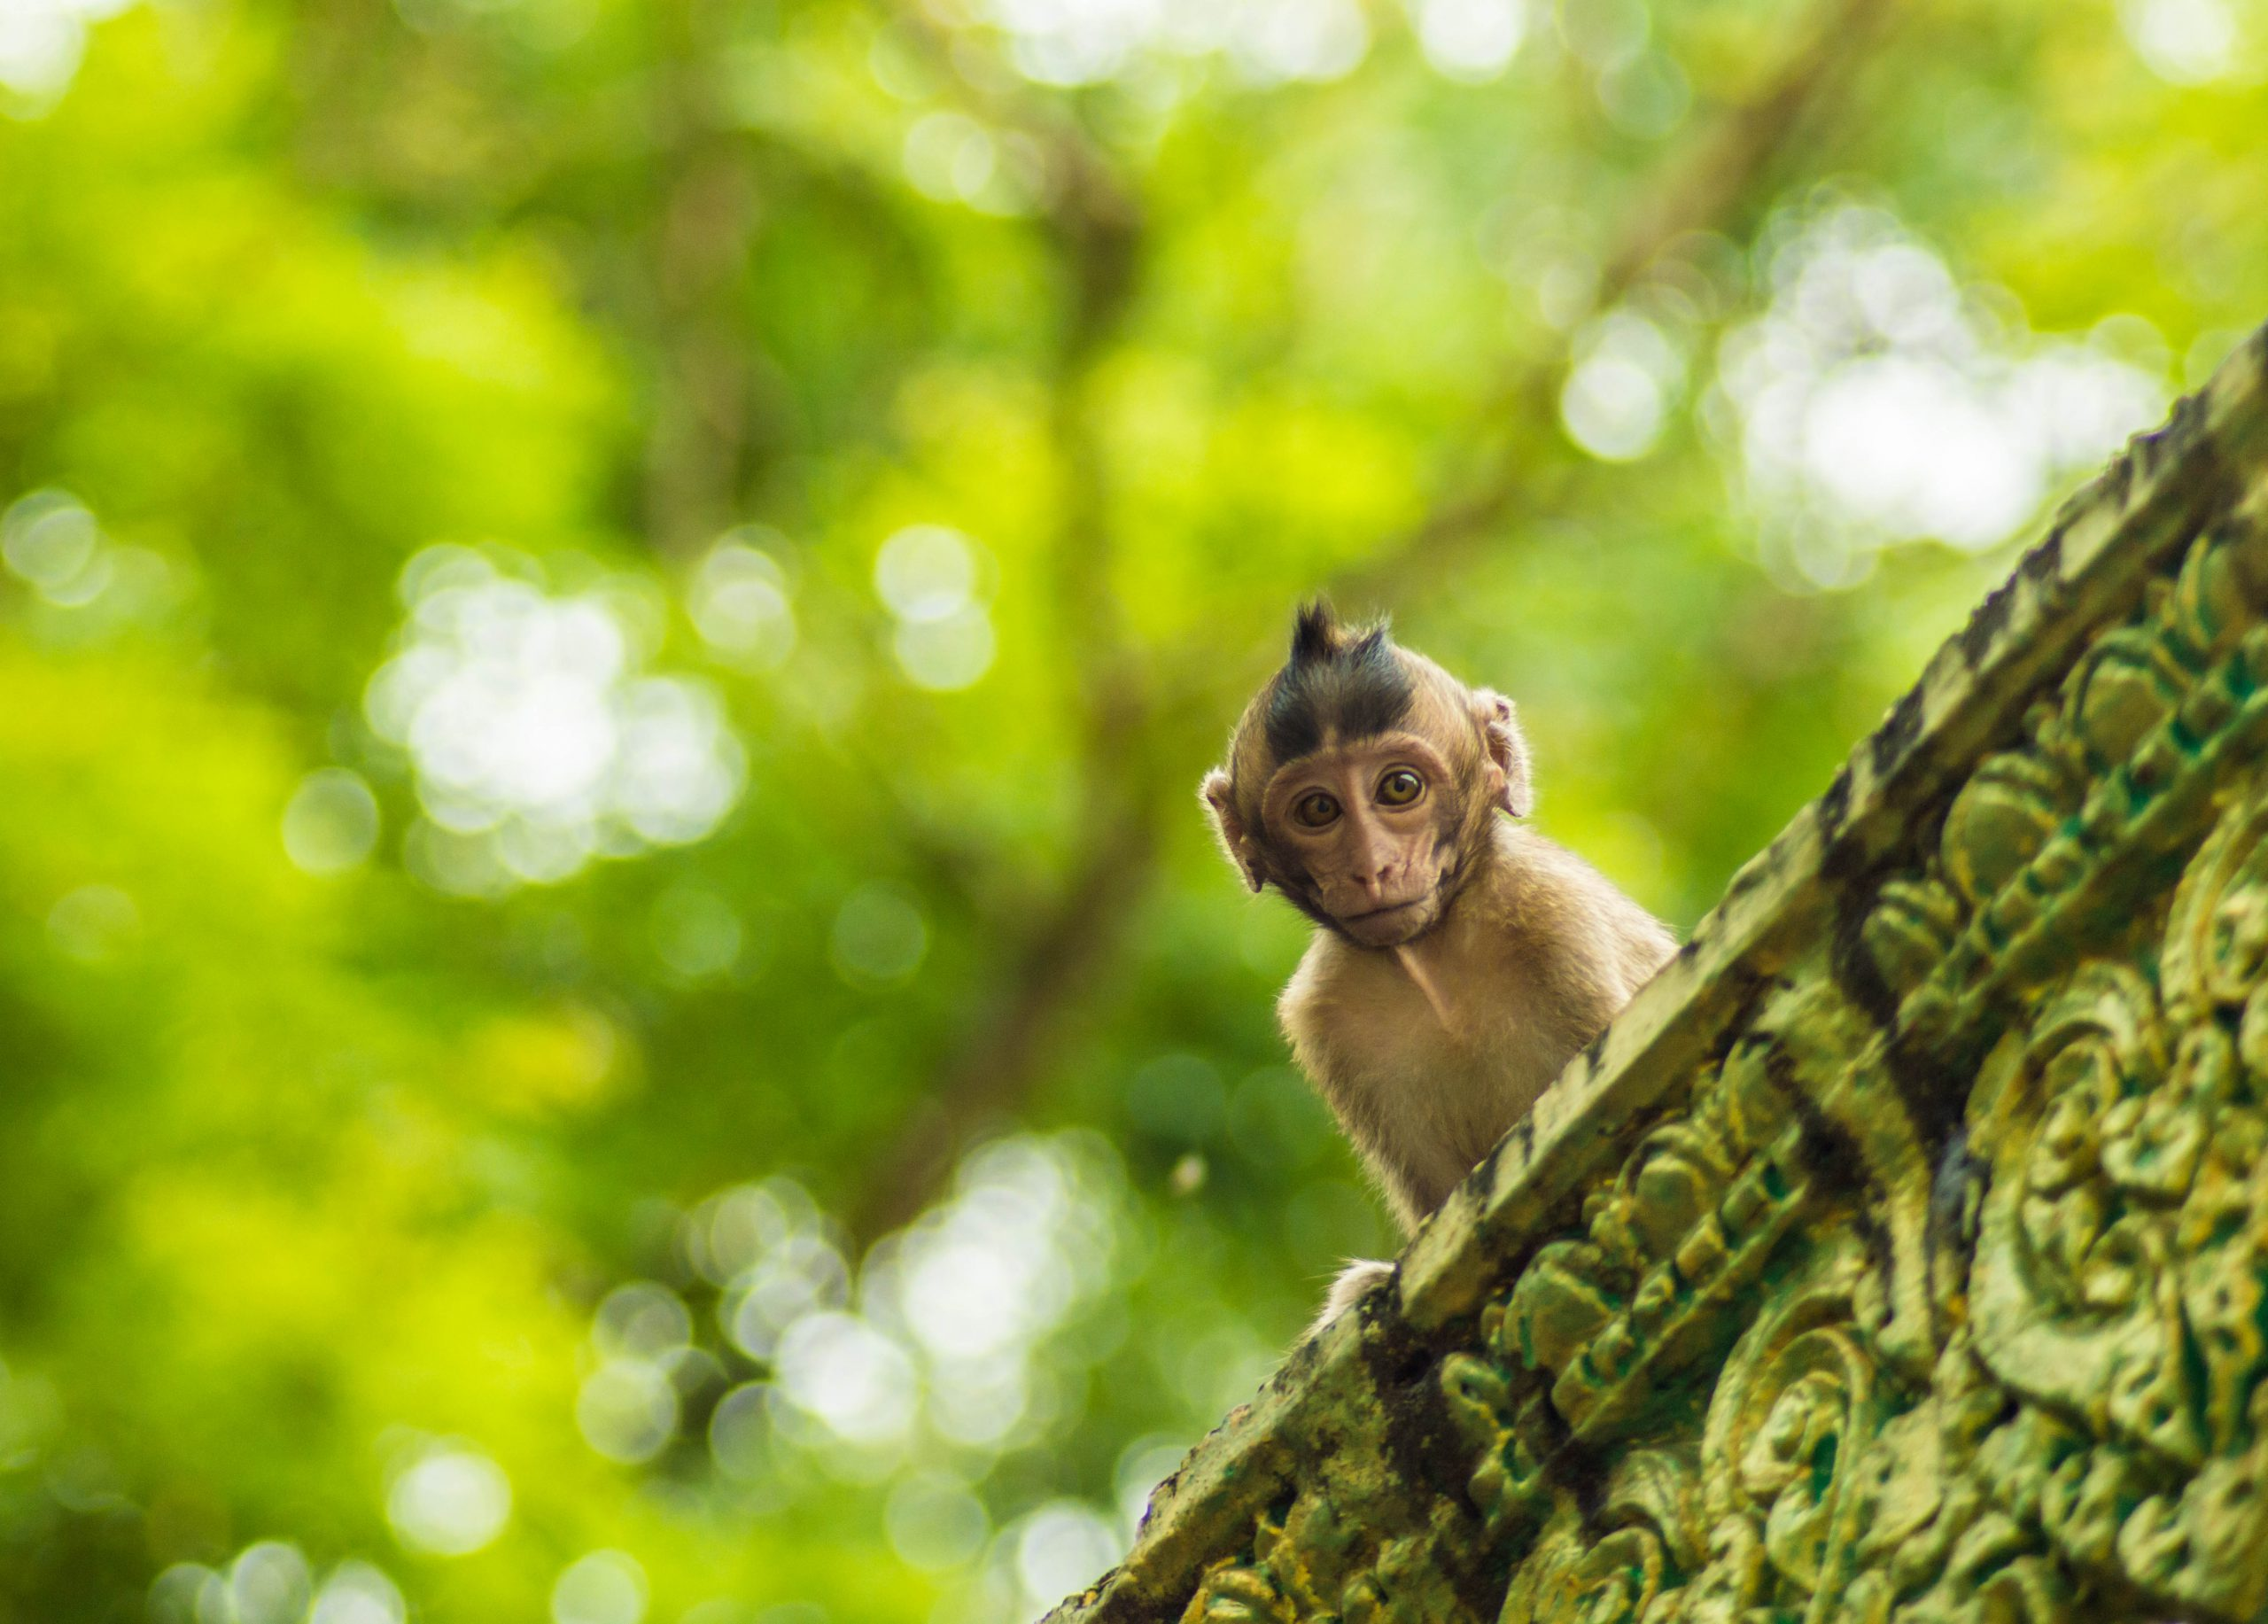 camps_international_sam_mccready_2018_wildlife